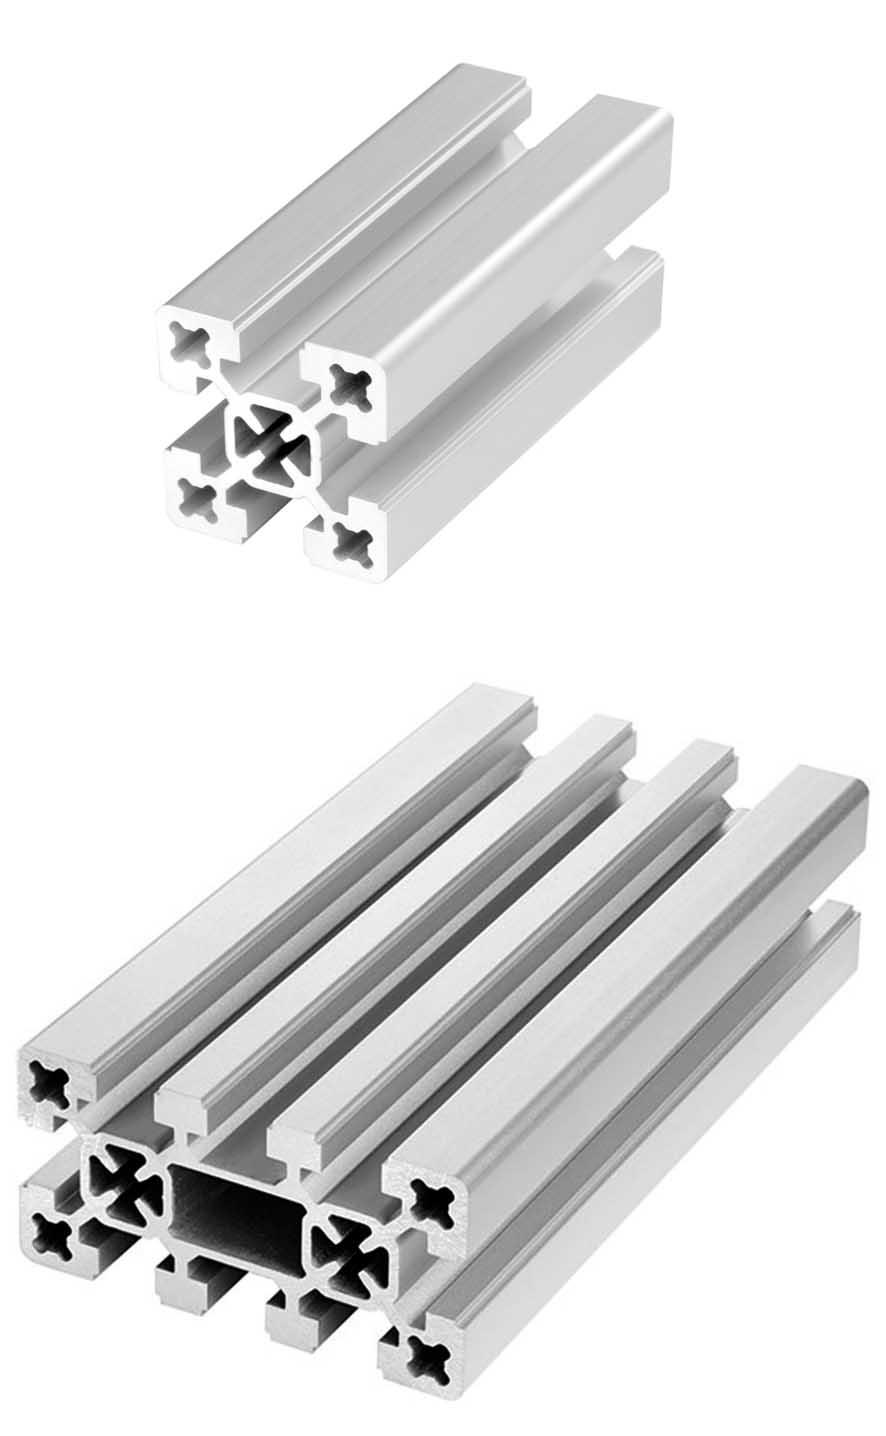 aluminium profiles profile systems construction profiles rk rose krieger. Black Bedroom Furniture Sets. Home Design Ideas